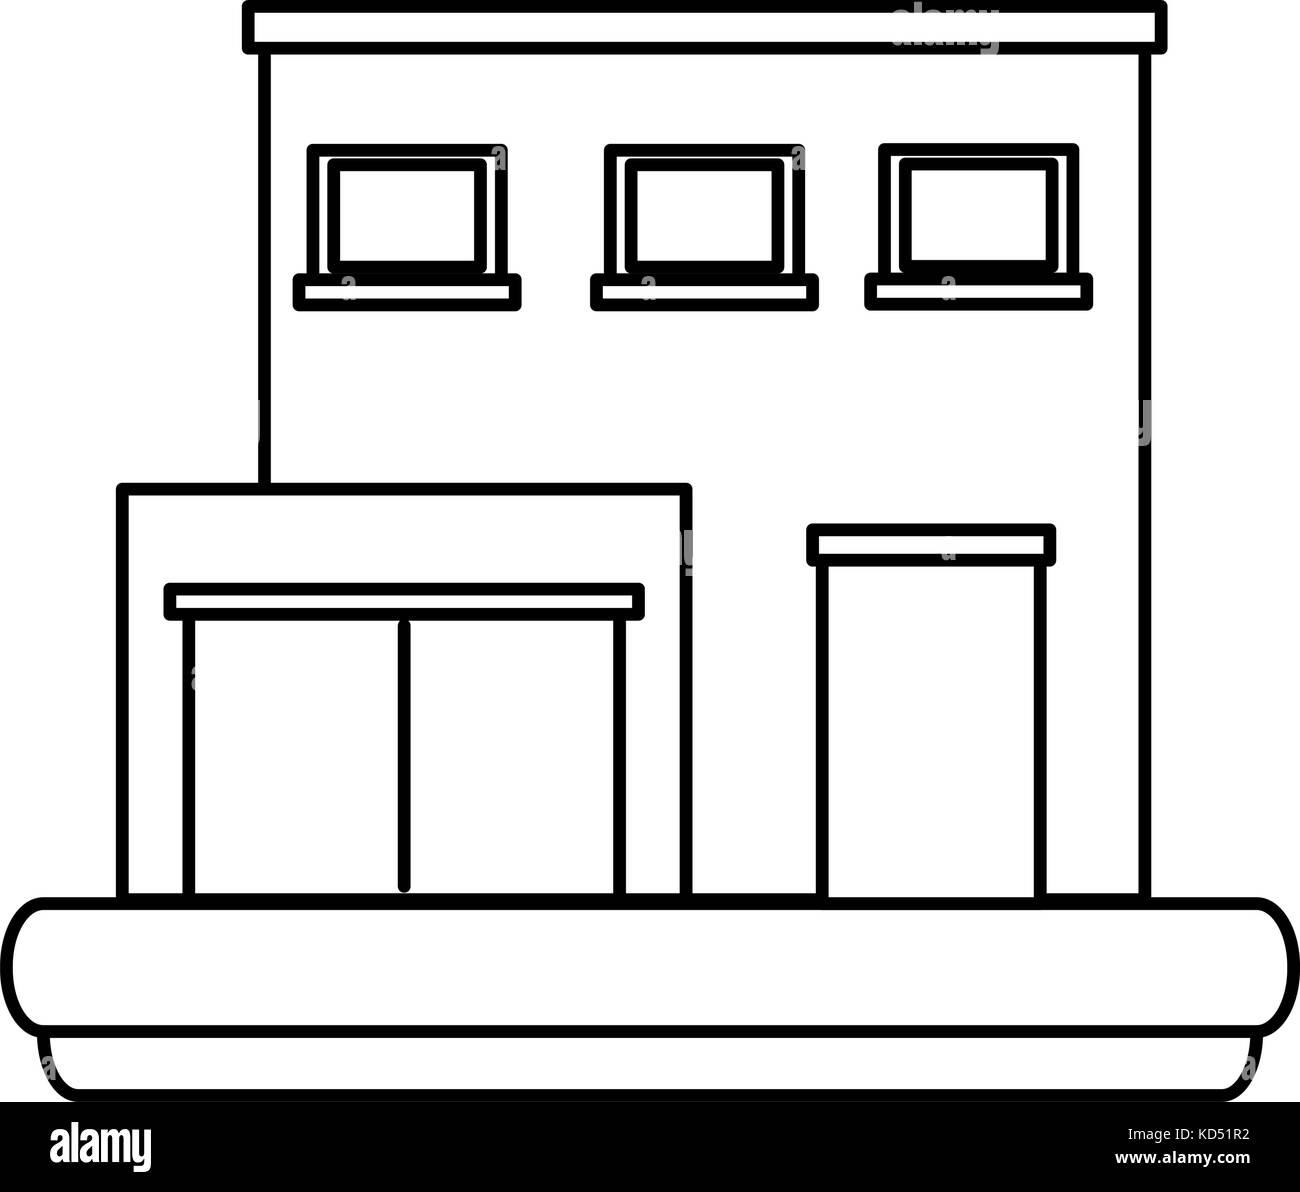 Warehouse building symbol stock vector art illustration vector warehouse building symbol biocorpaavc